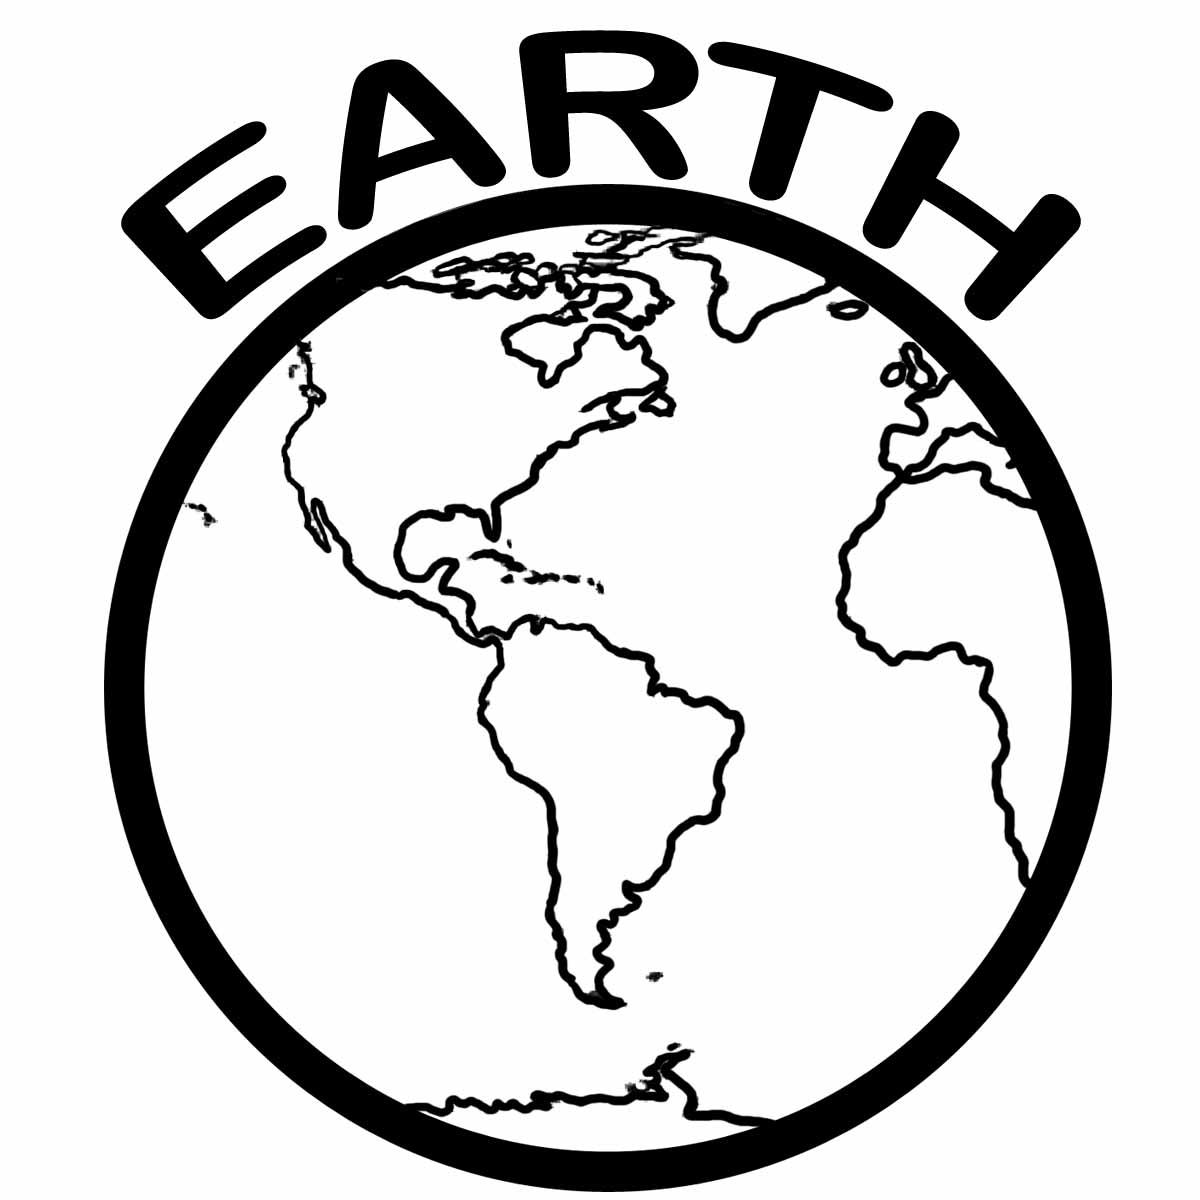 1200x1200 Planet Earth Clip Art Many Interesting Cliparts